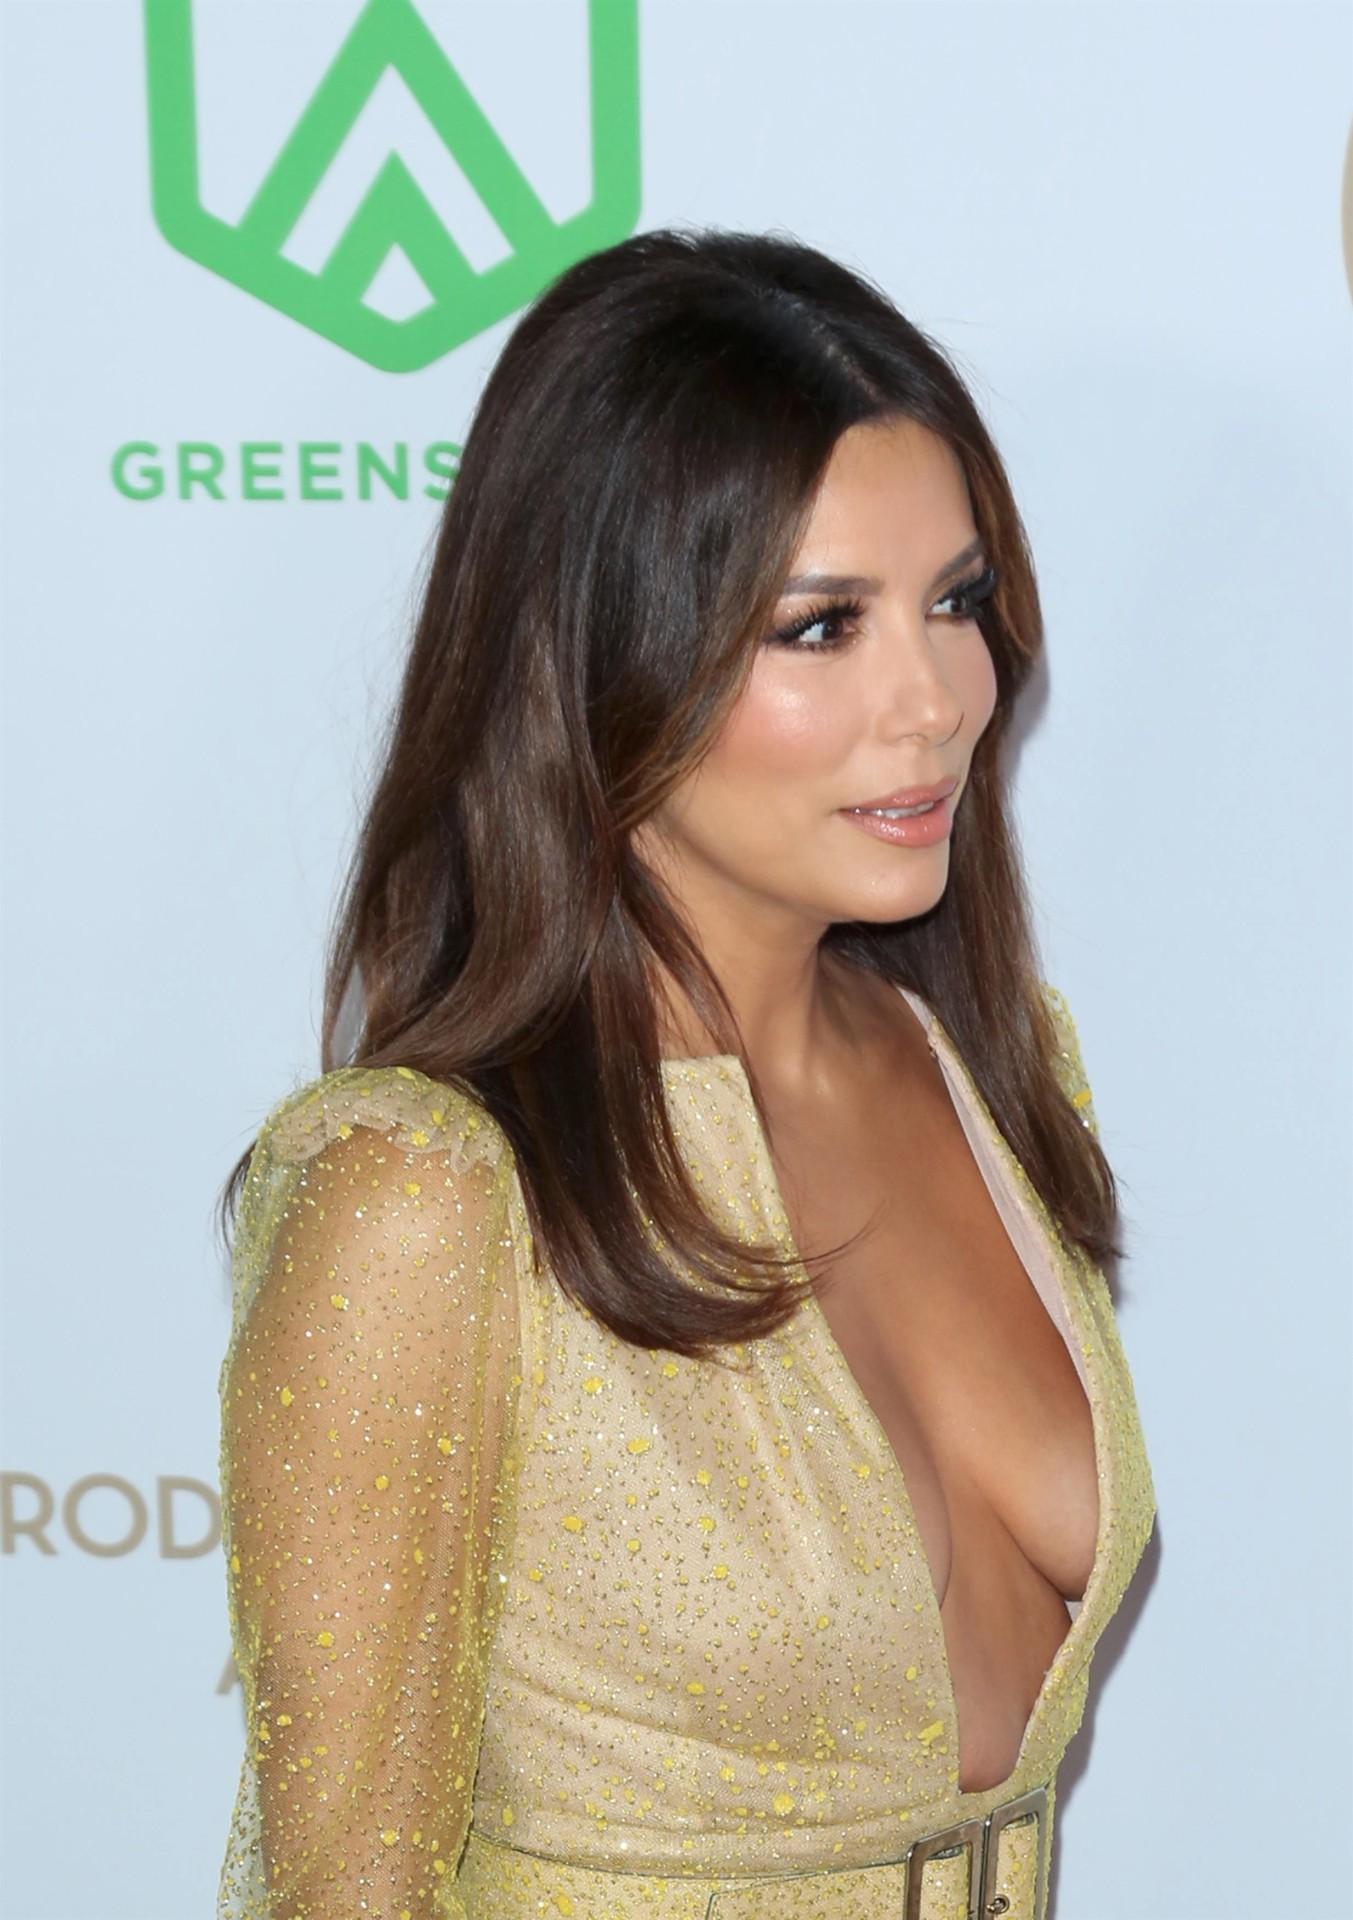 Eva Longoria No Source Celebrity Beautiful Babe Posing Hot